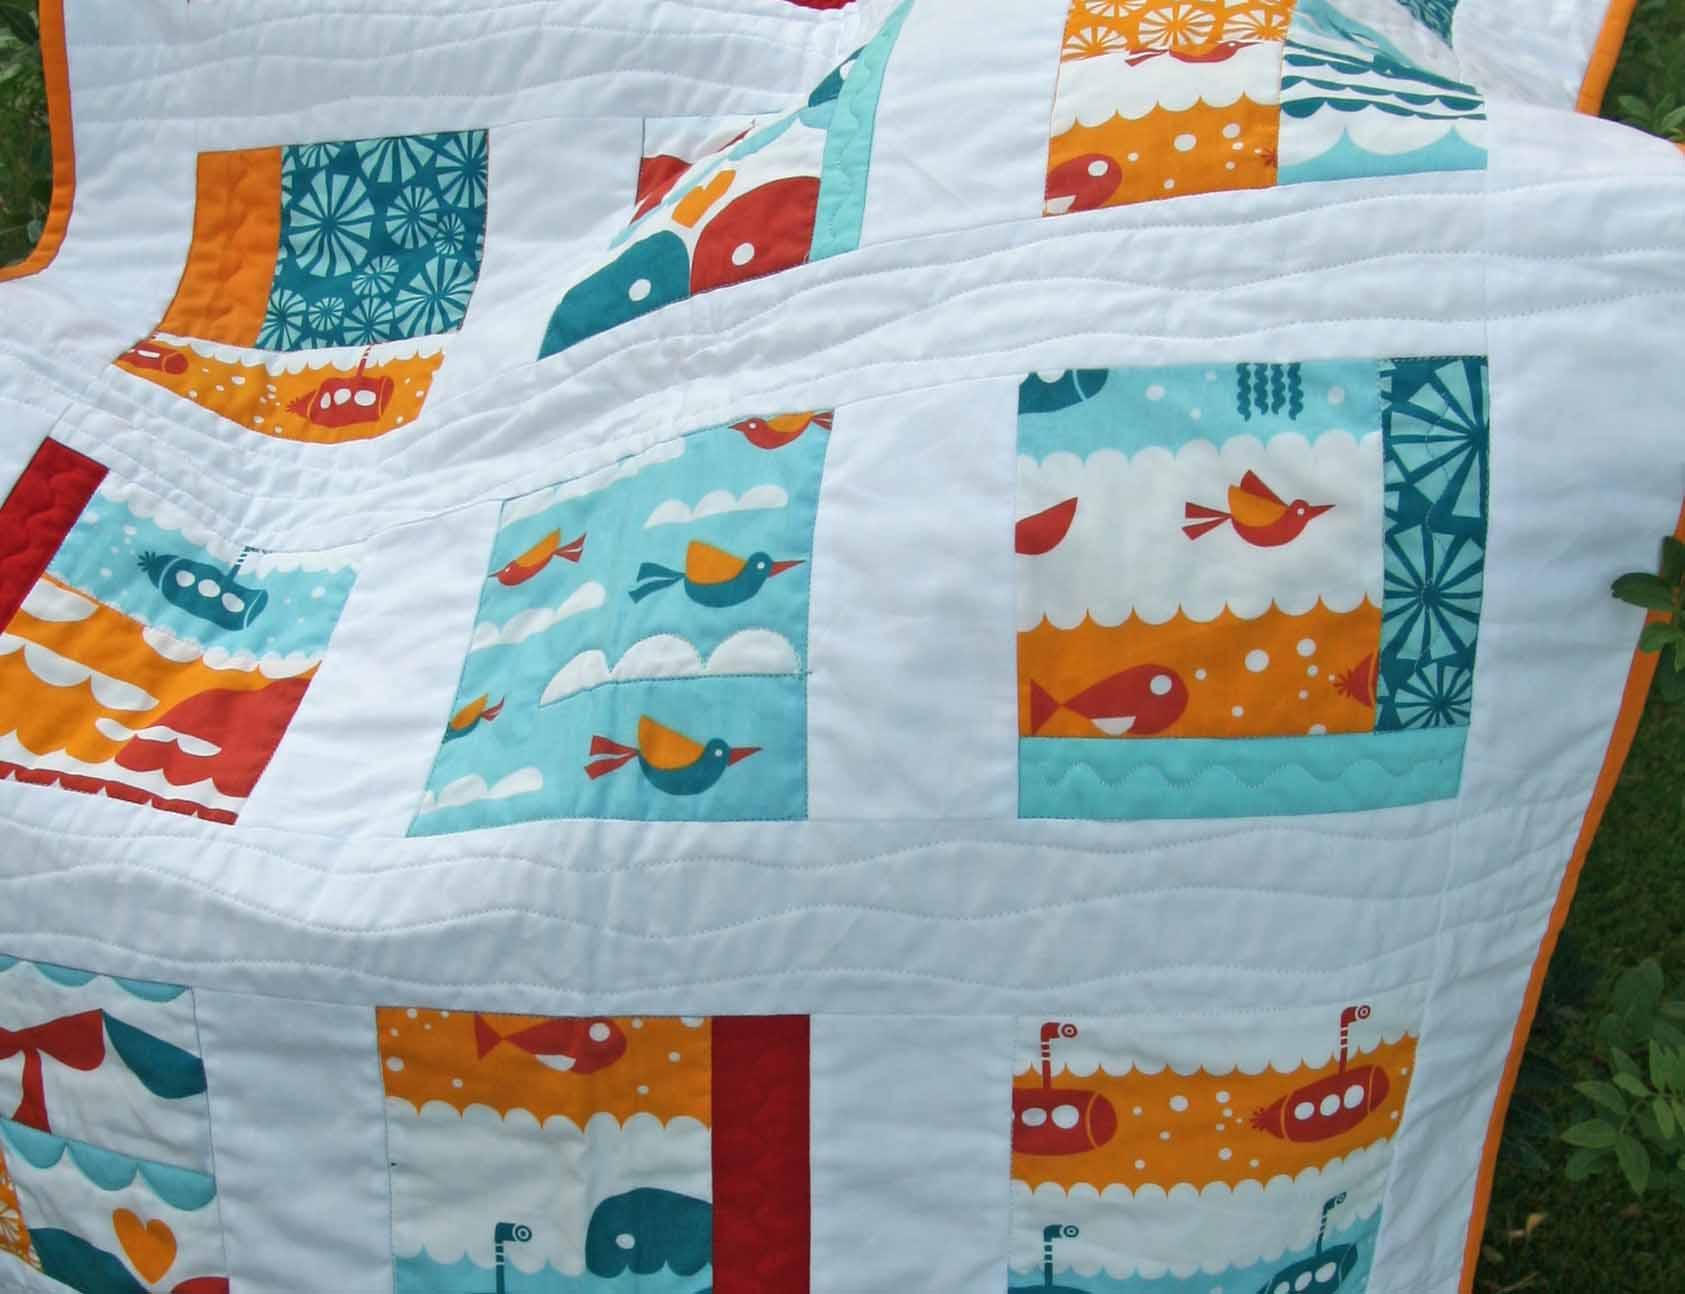 Pin manualidades colcha patchwork para cuna pelautscom on - Colchas patchwork infantiles ...